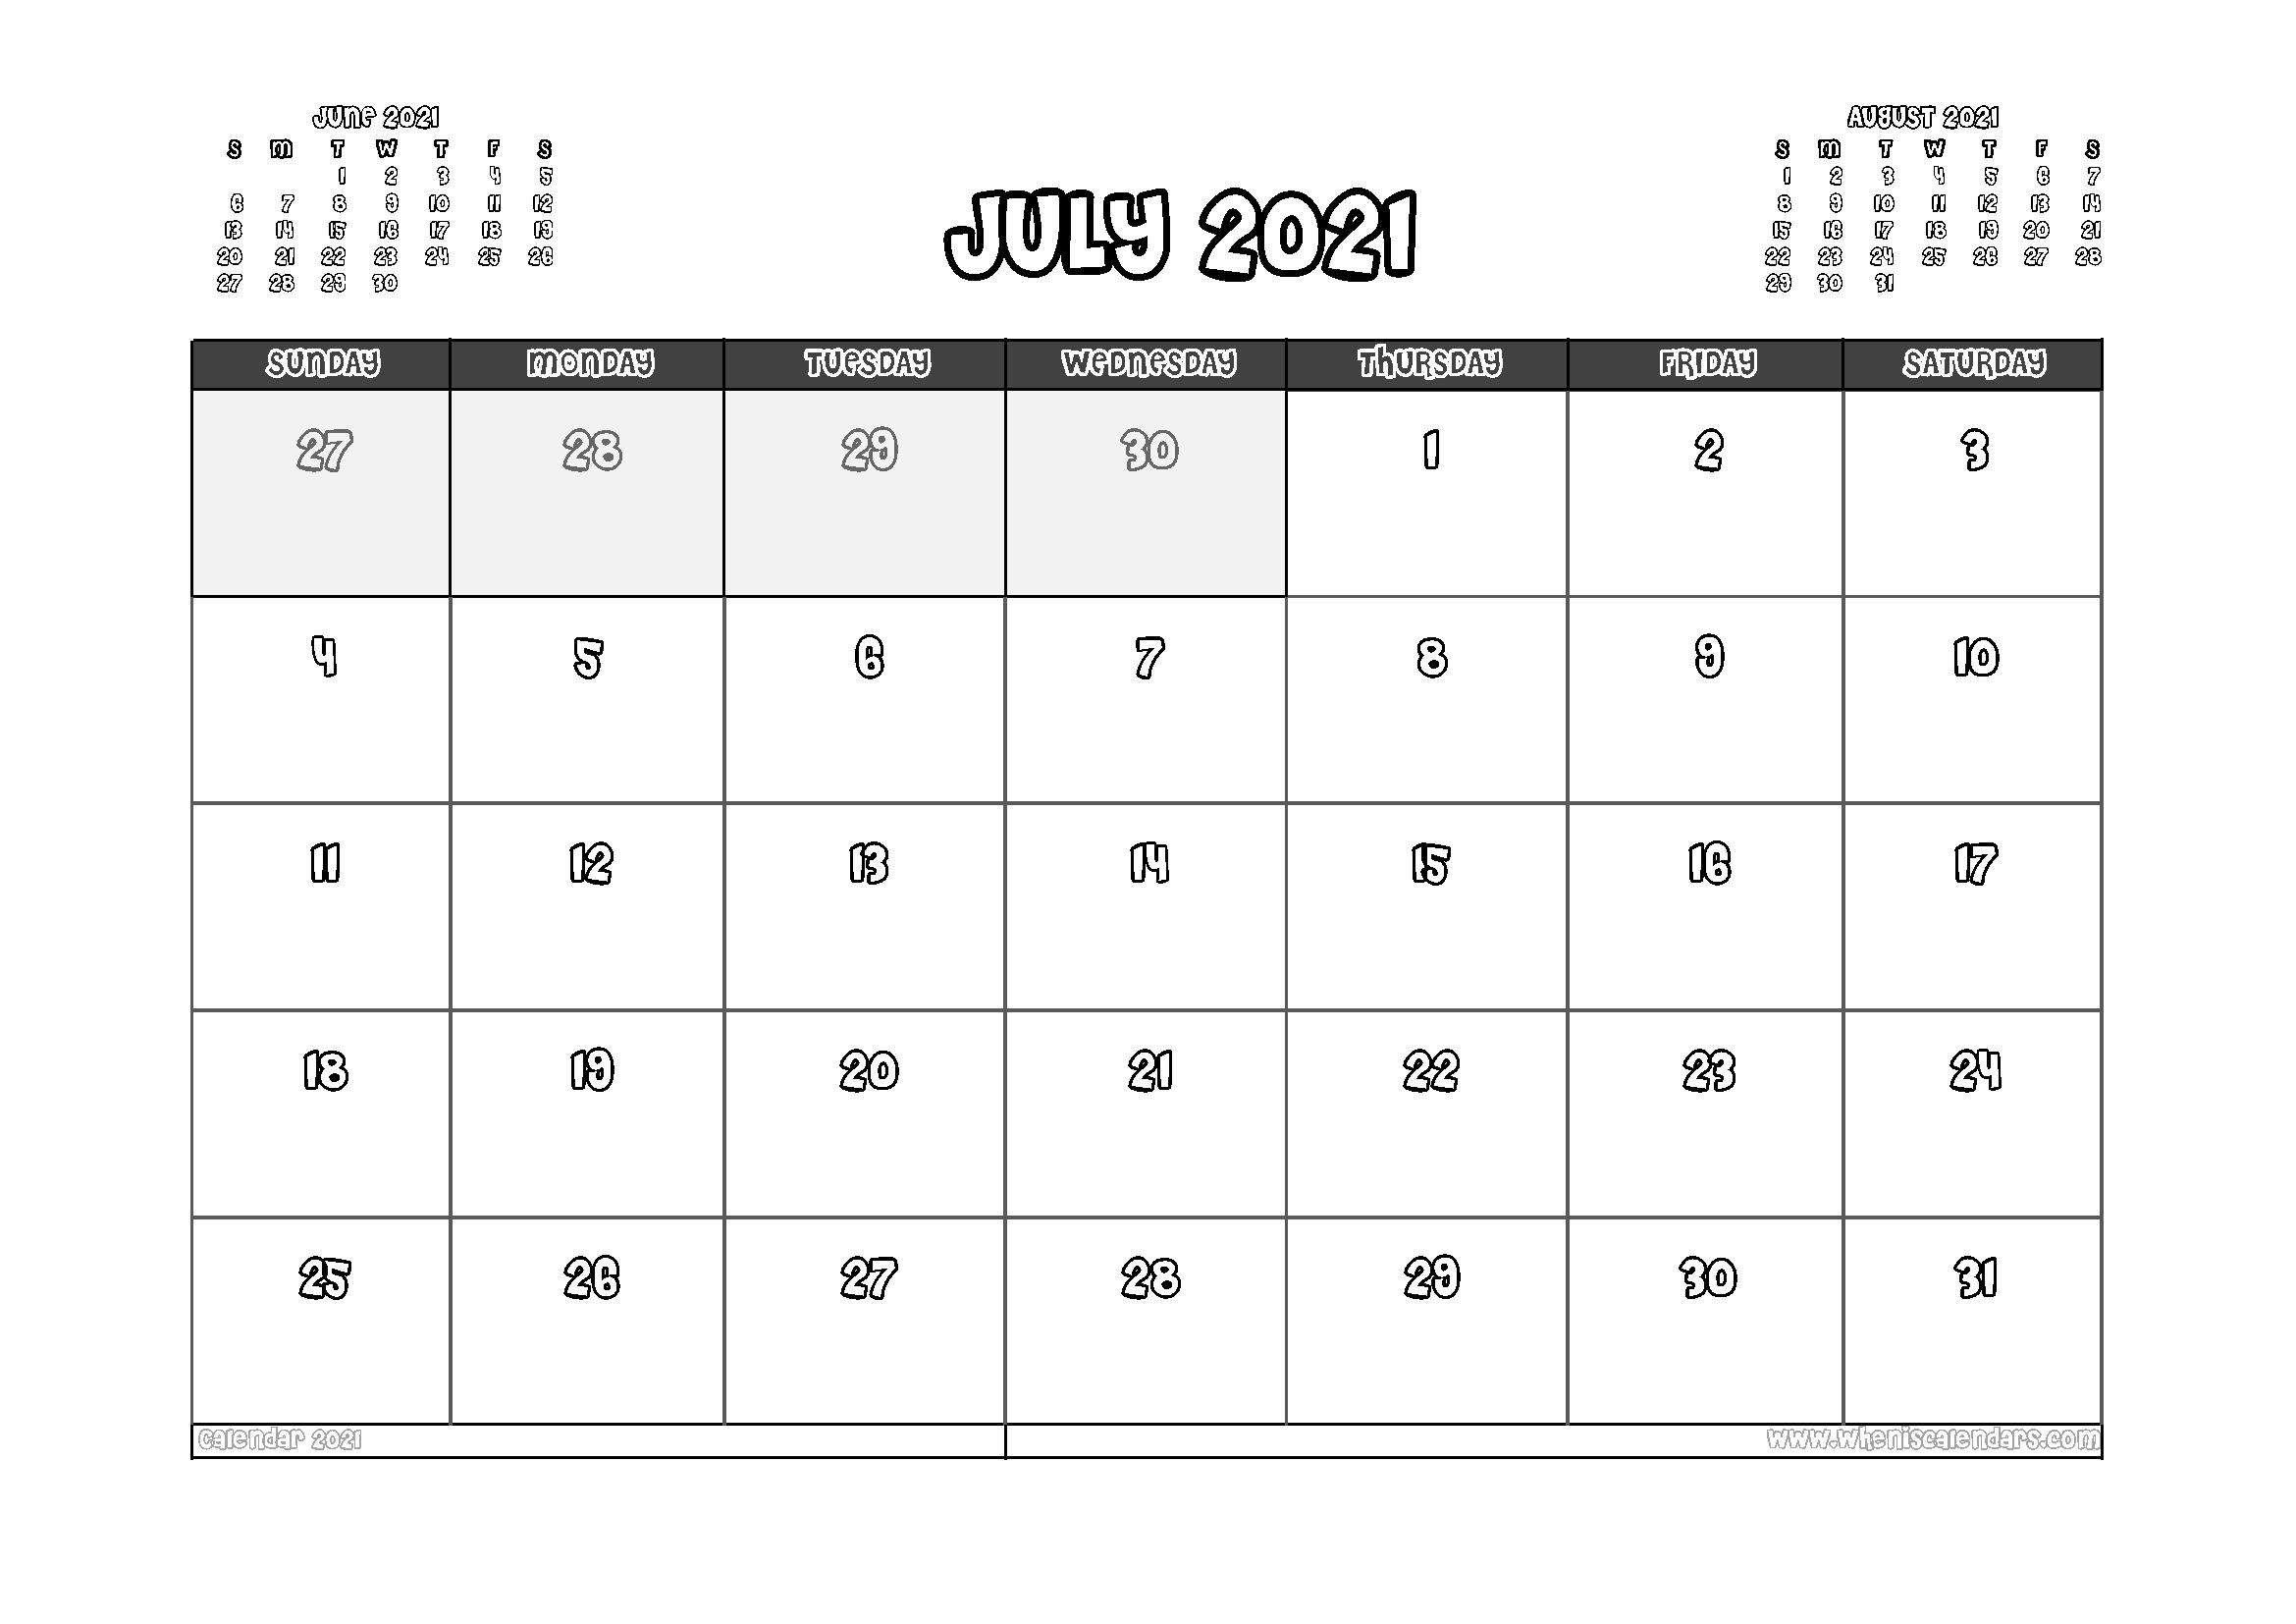 Free Printable July 2021 Calendar Australia